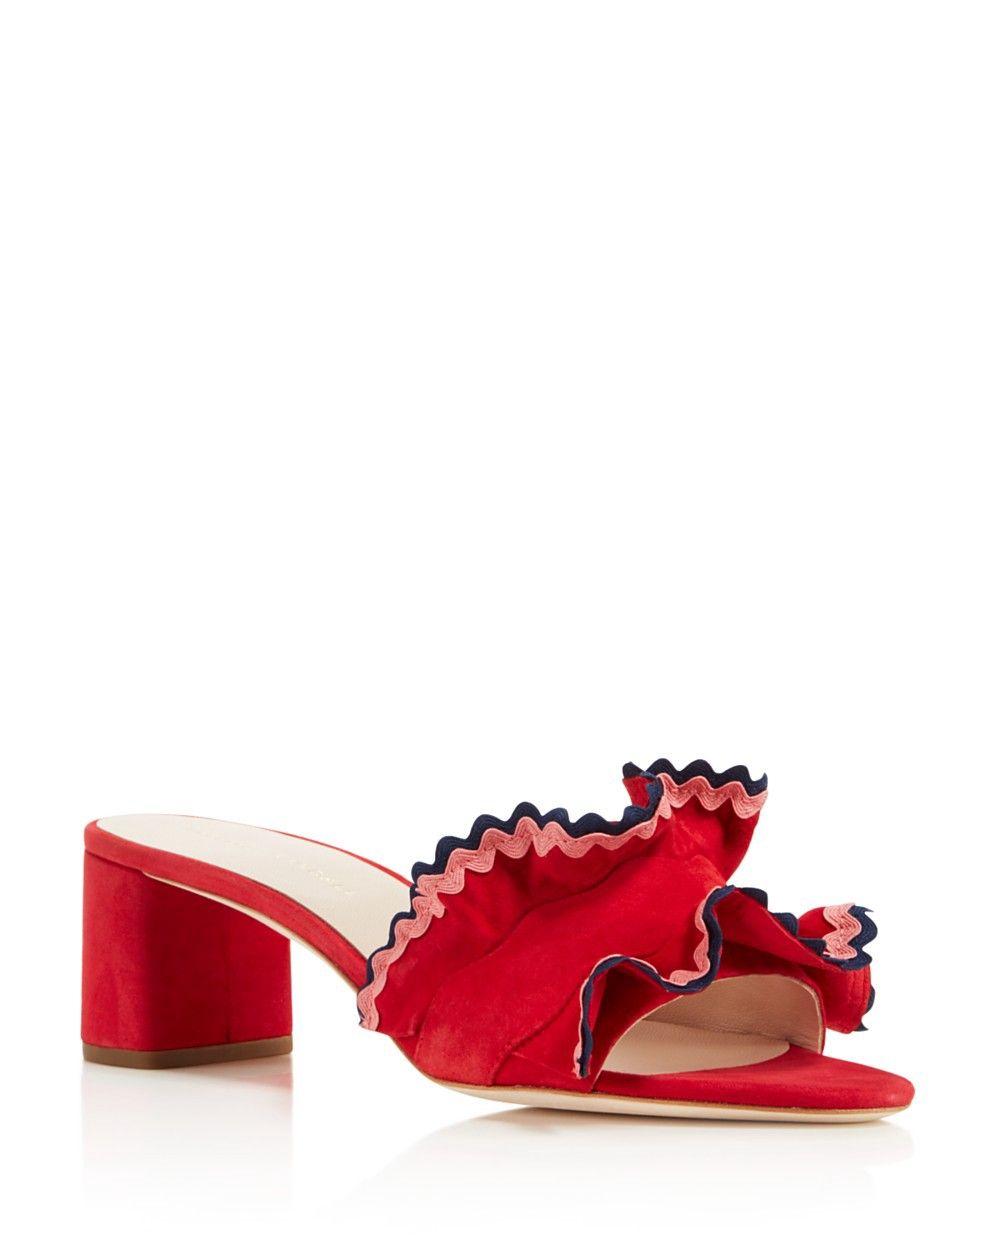 31c4ffab73d LOEFFLER RANDALL Loeffler Randall Women s Vera Suede Ruffle Block Heel Slide  Sandals.  loefflerrandall